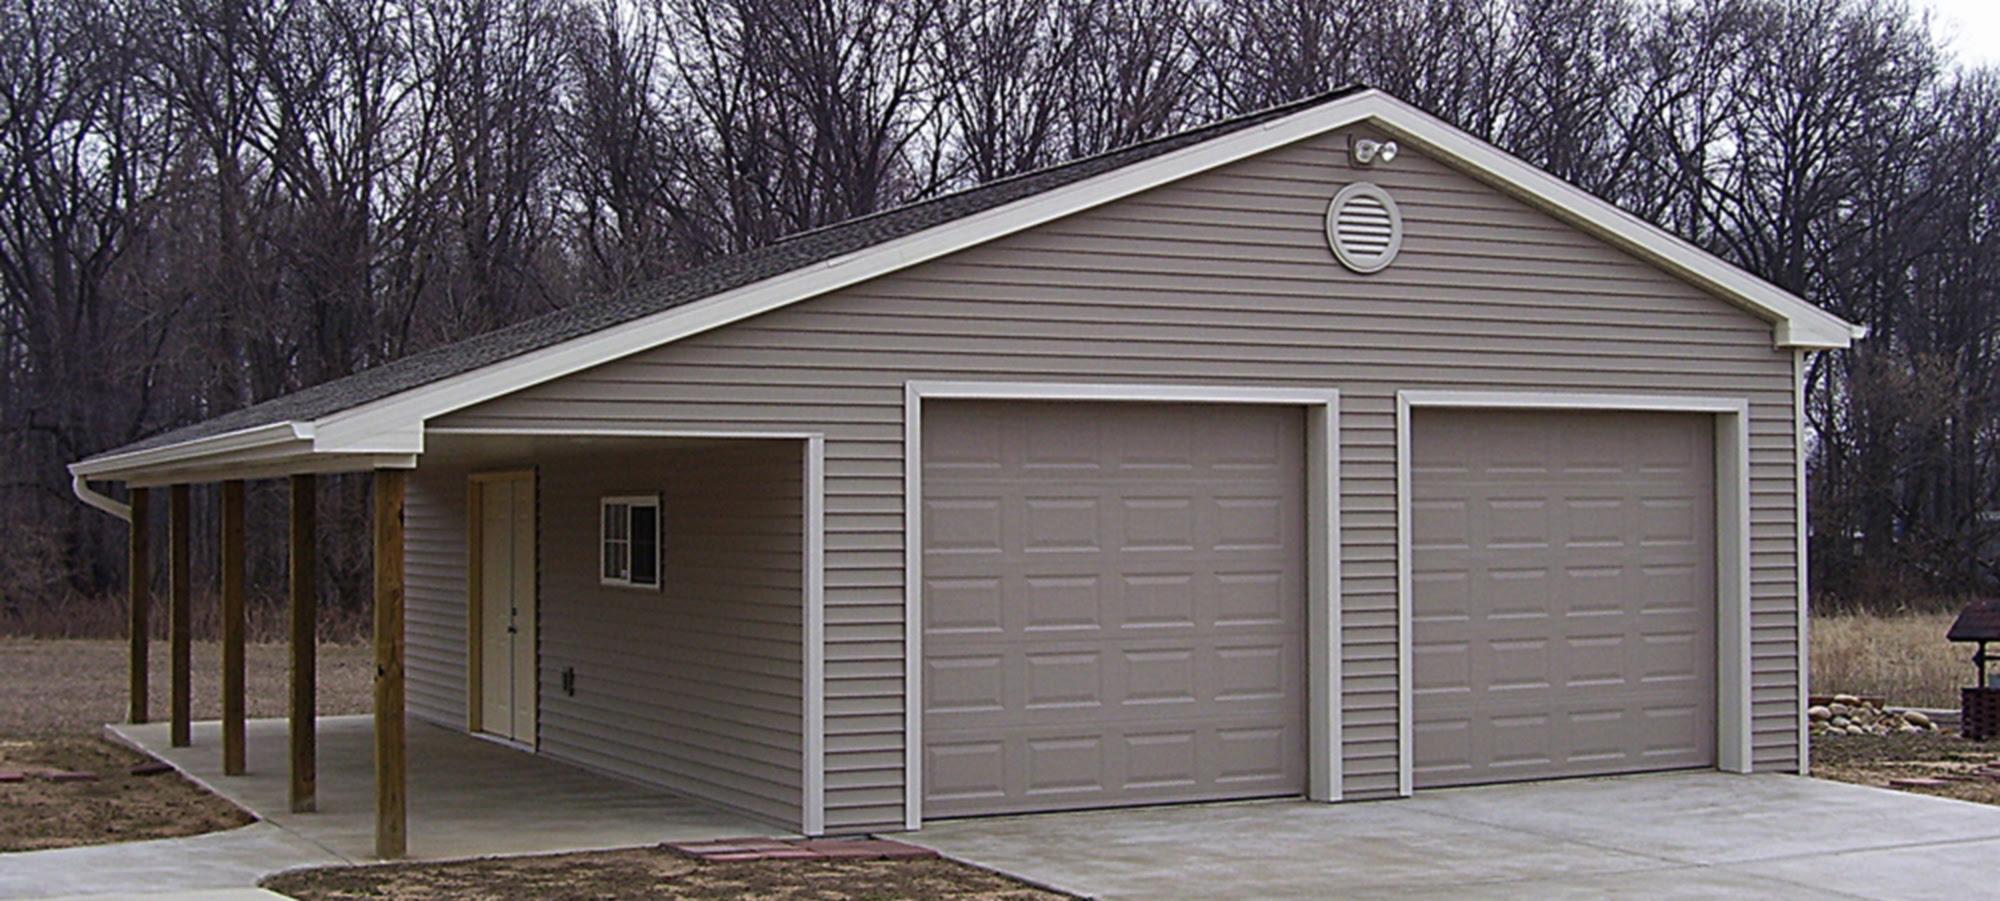 Garages Osborne Construction